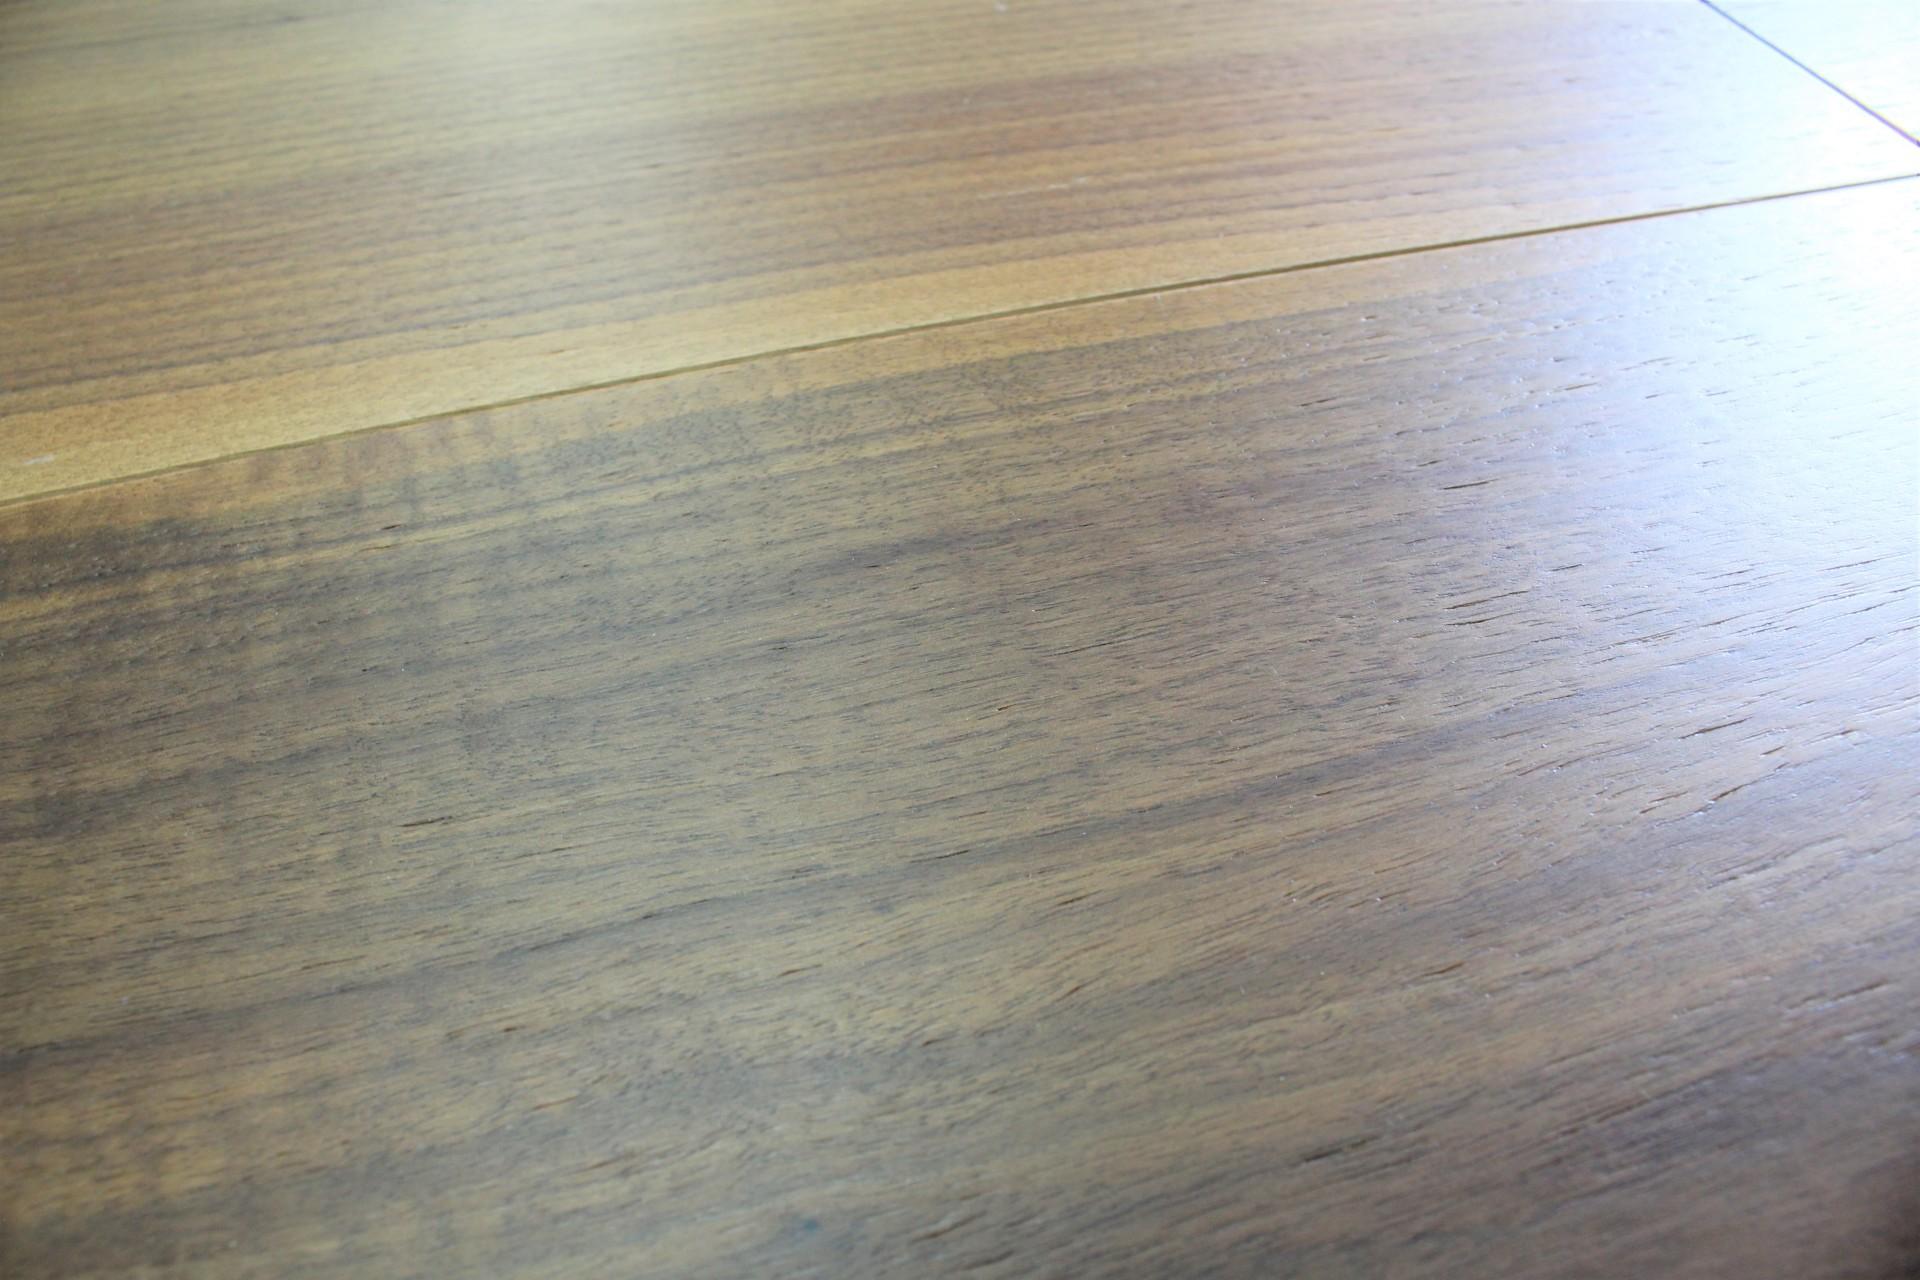 Hardwood, prefinished floor, engineered wood, solid wood, lifestyle, hard surface, prefinished hardwood, prefinished wood, home, design, interior design, wood floor design, LW flooring